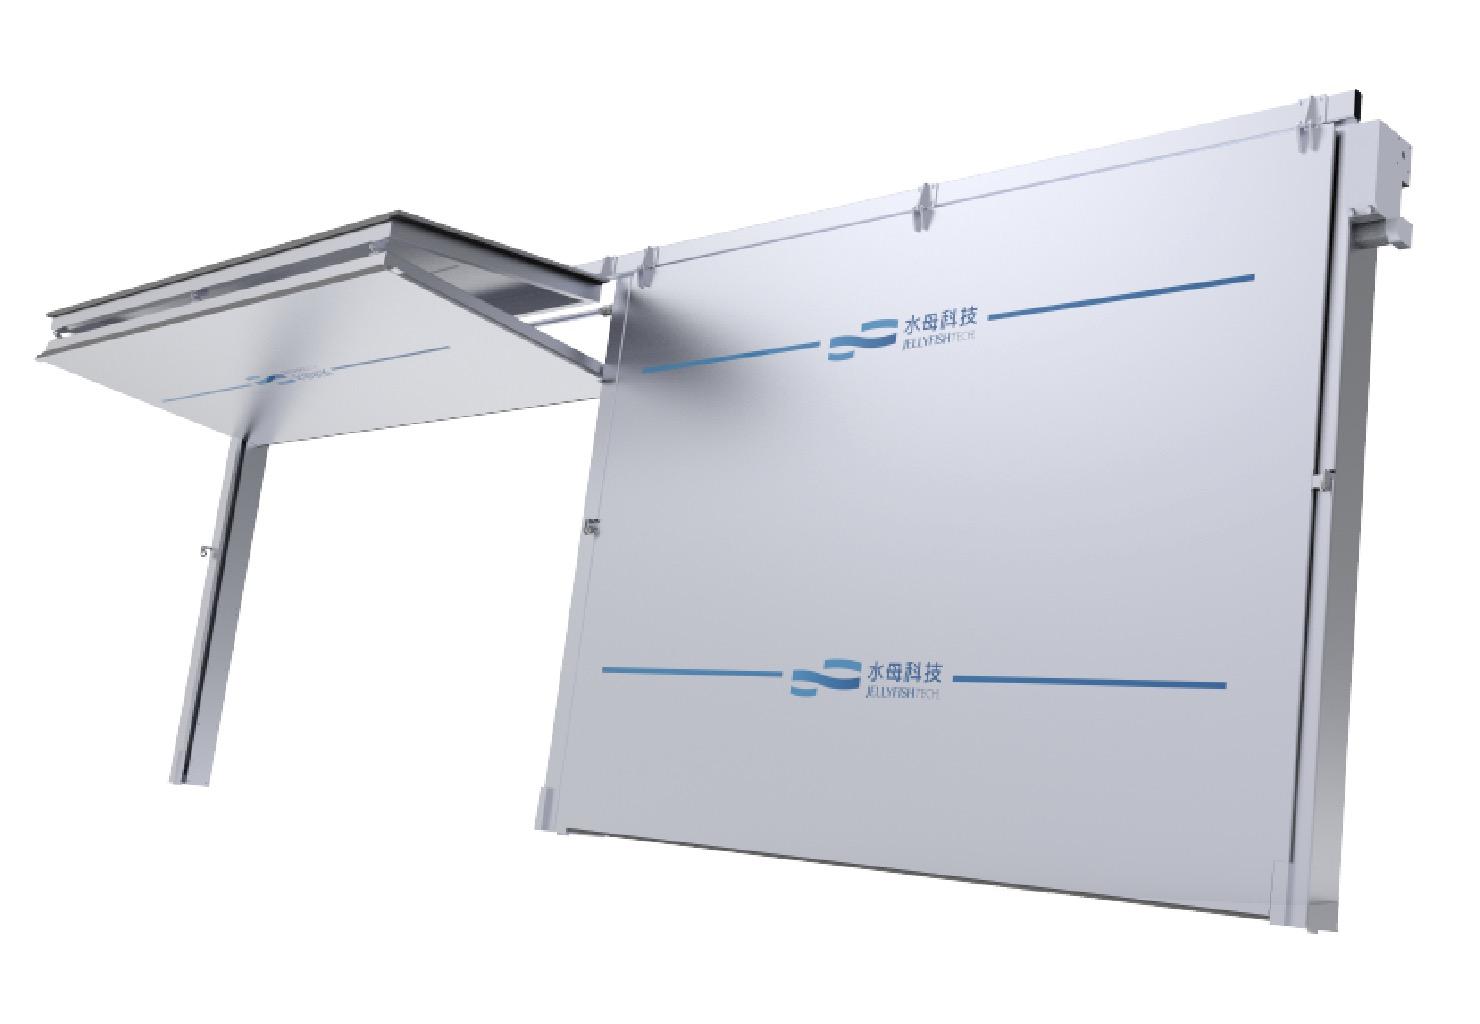 SZ-FZ160-A智能折疊式擋水門